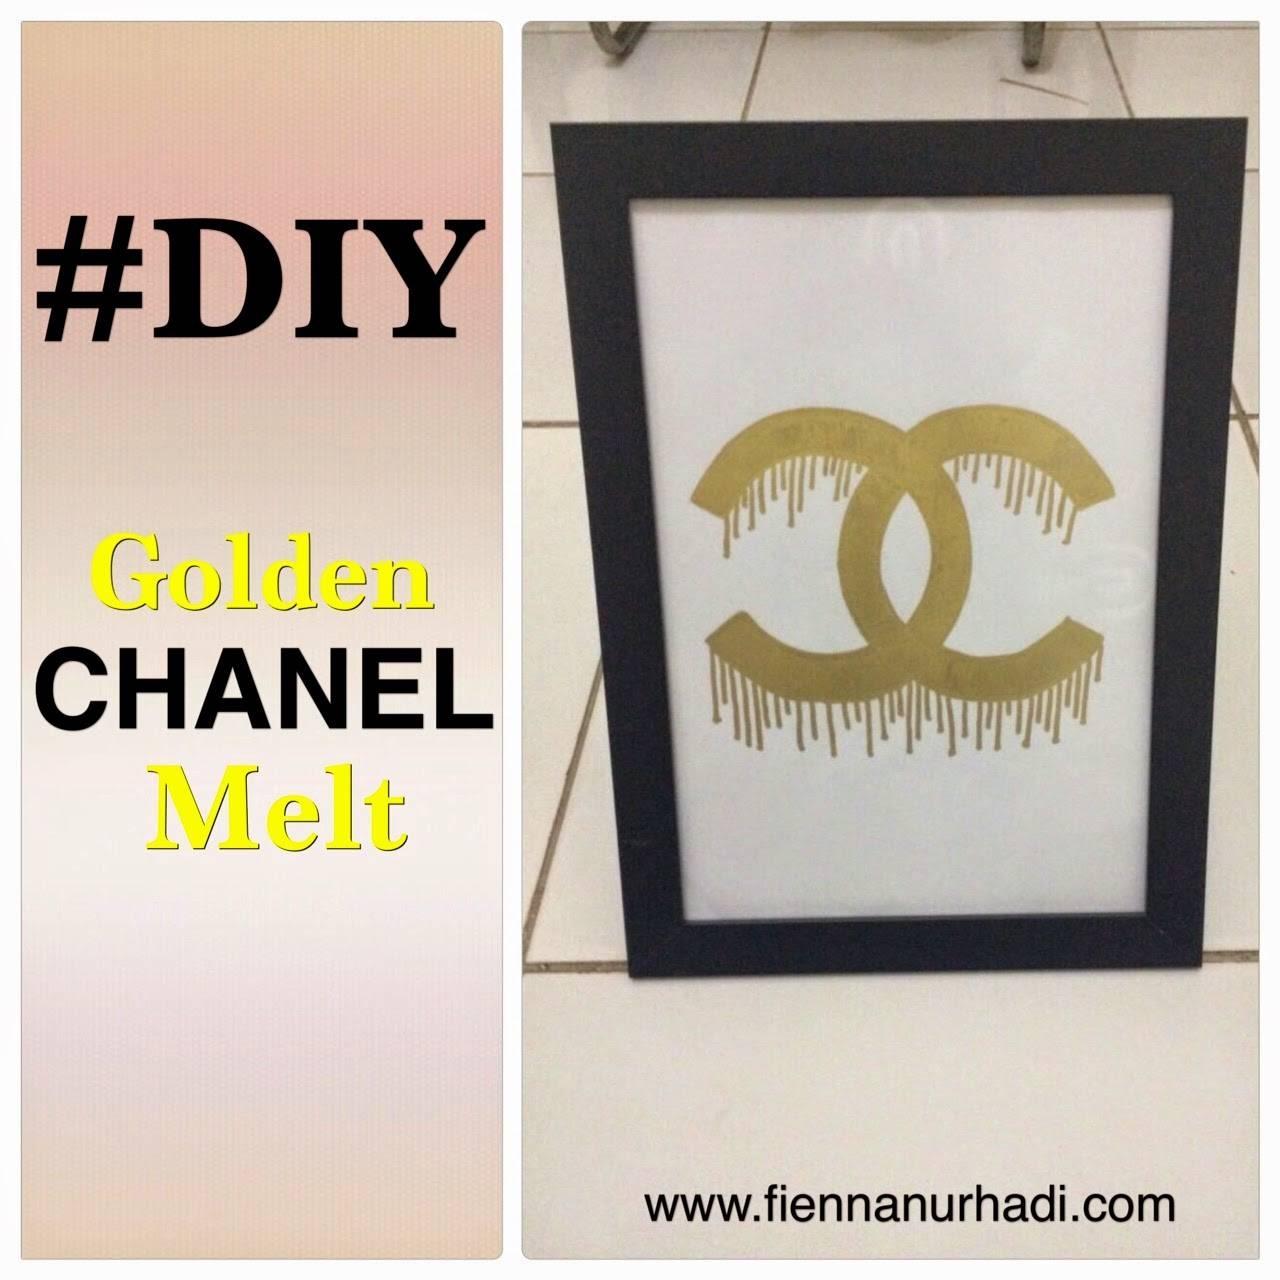 Diy Gold Chanel Melting Wall Decor | Fienna Nurhadi's Blog Throughout 2017 Chanel Wall Decor (View 3 of 25)